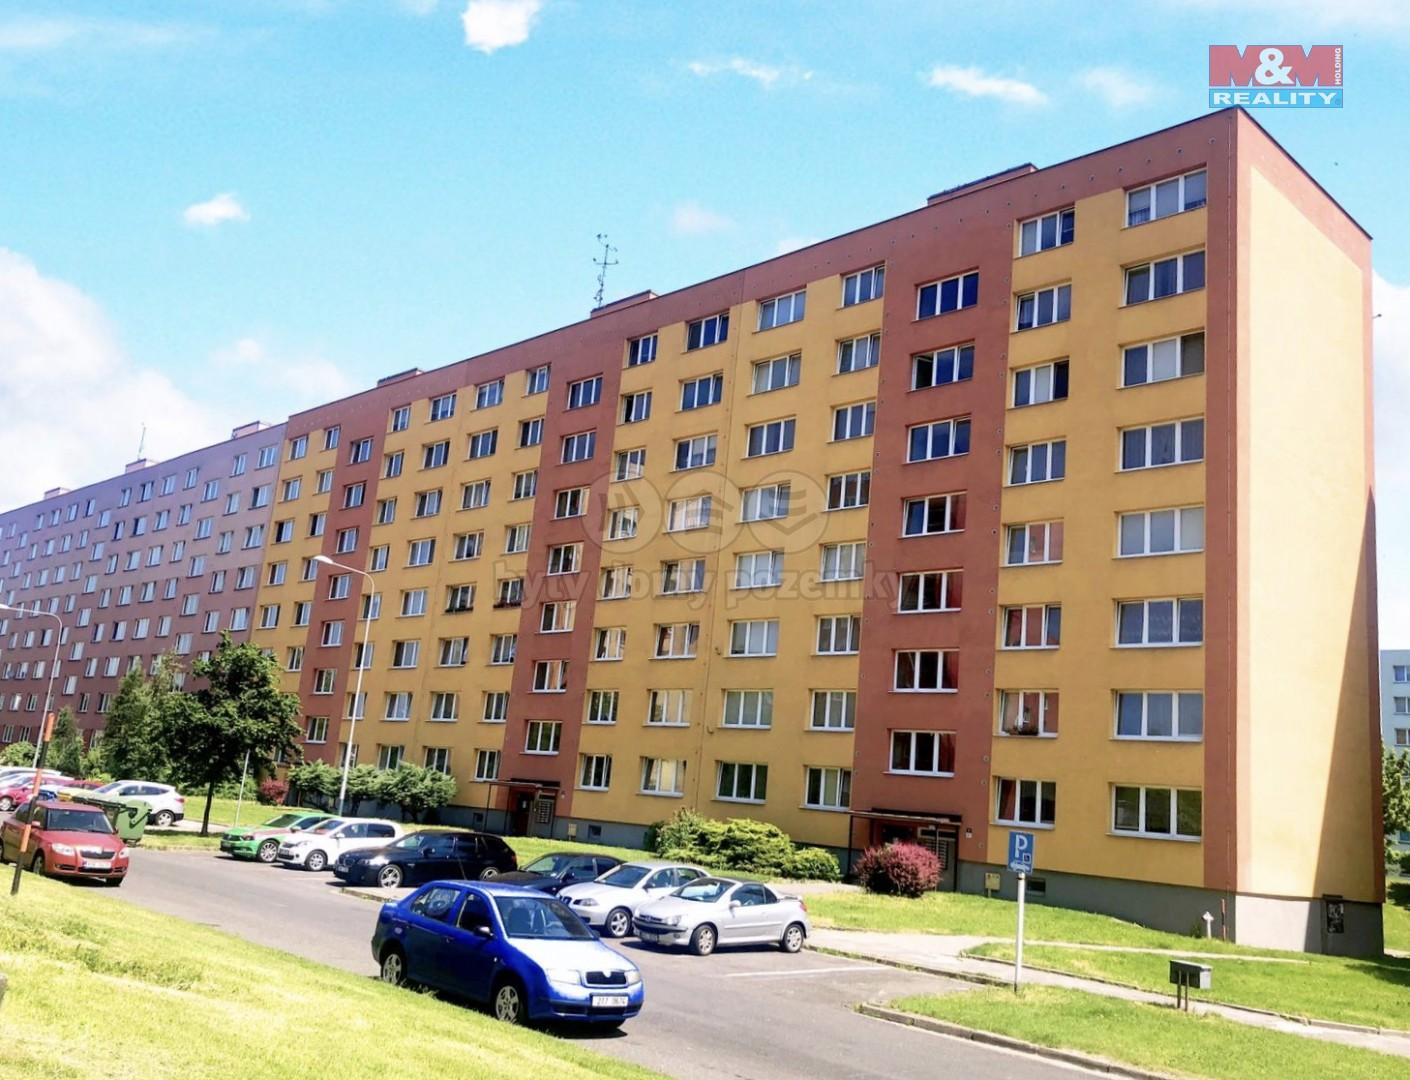 Prodej, byt 3+1, 74 m2, Ostrava - Dubina, ul. Fr. Formana